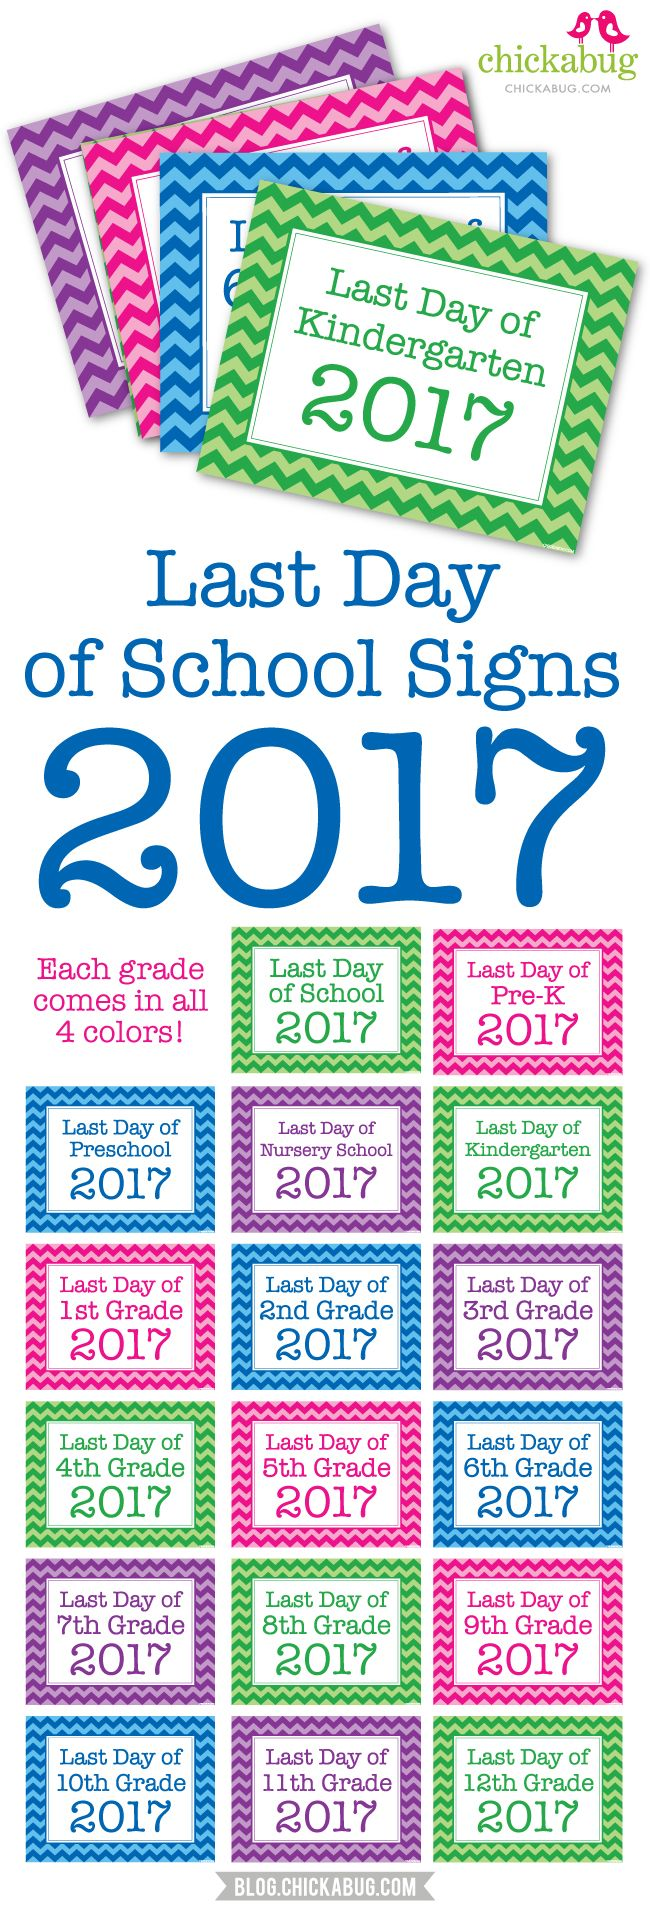 Free printable last day of school signs - great photo op!